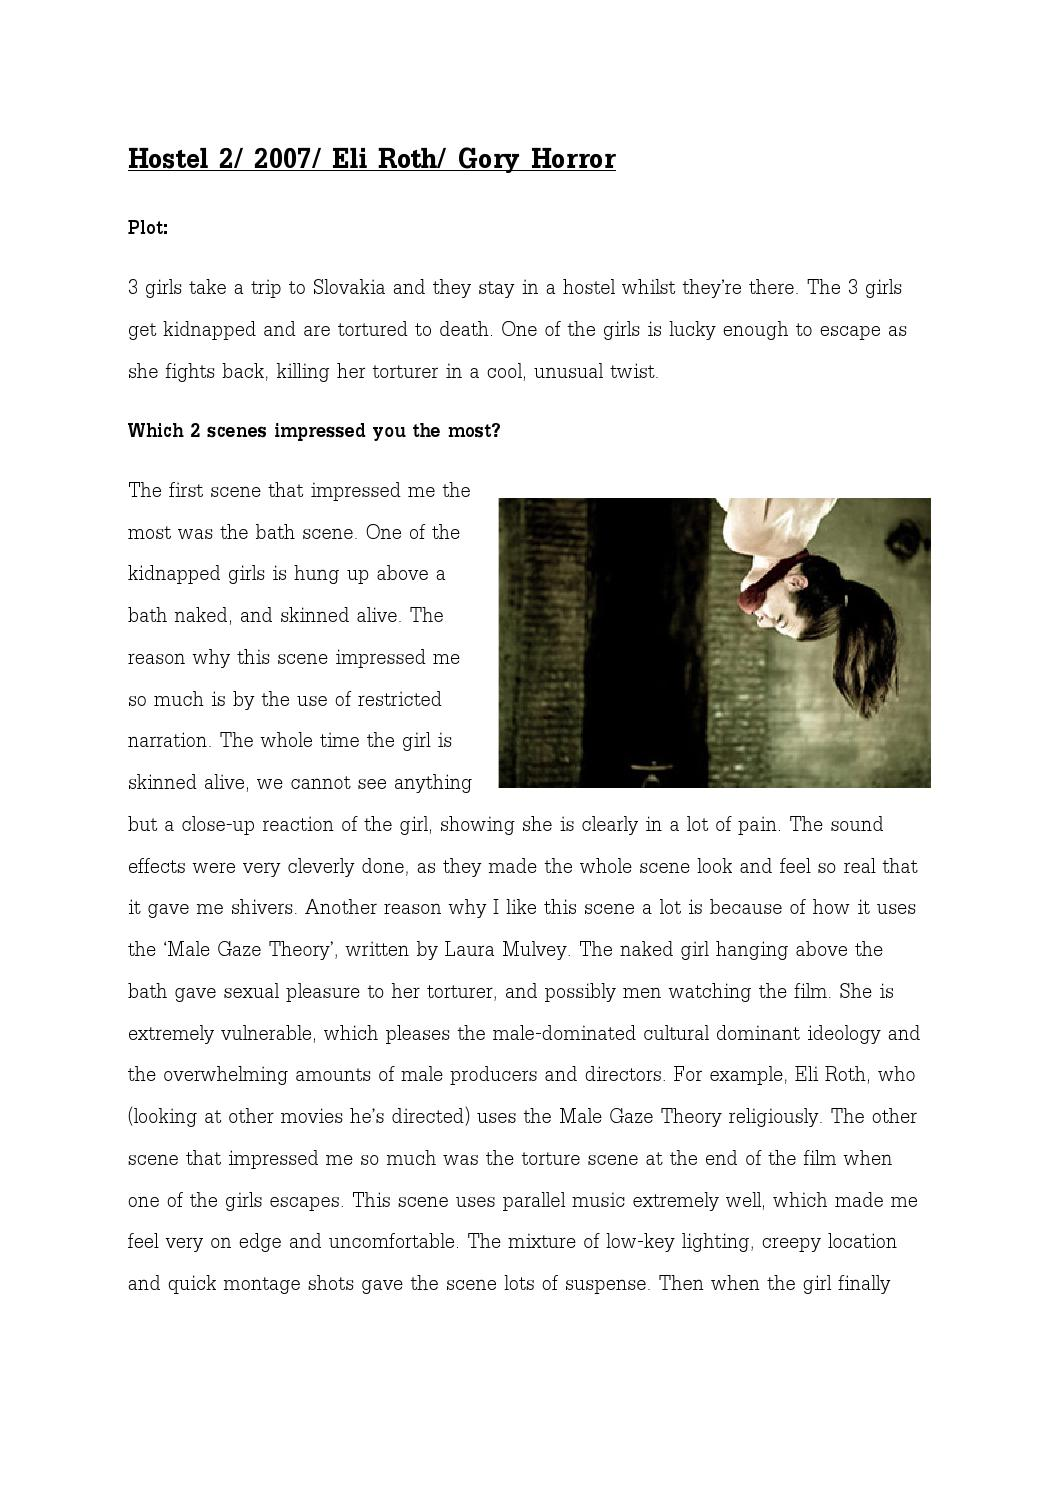 Hostel 2 film review by Joe Donaldson - issuu